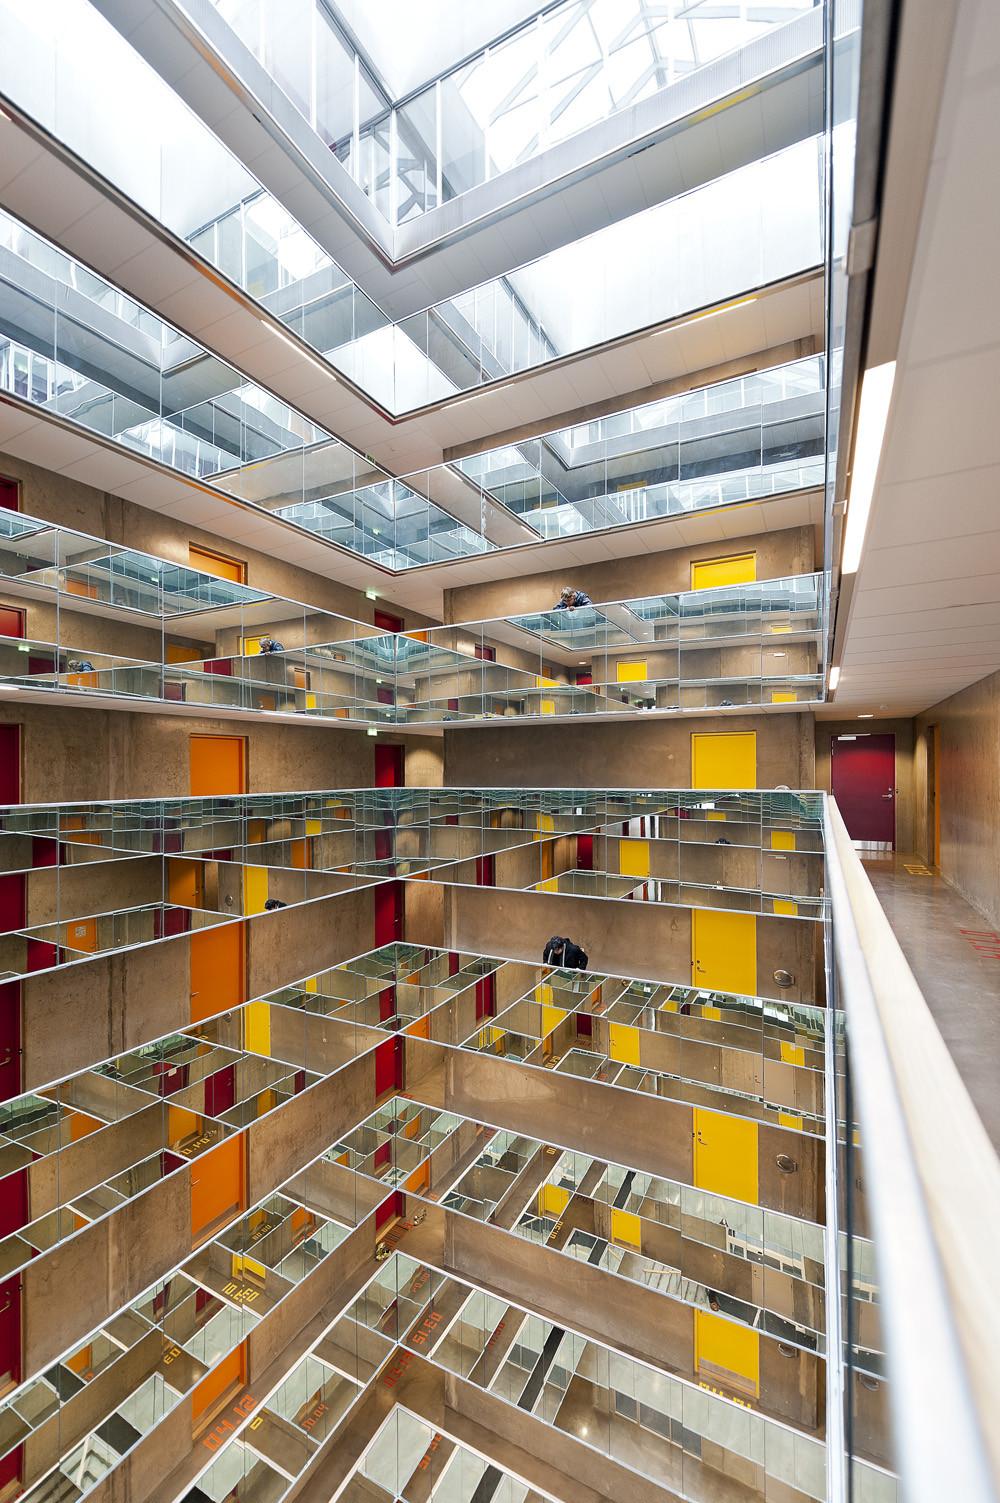 the-tree-mag-grundfos-dormitory-by-cebra-architecture-40.jpg